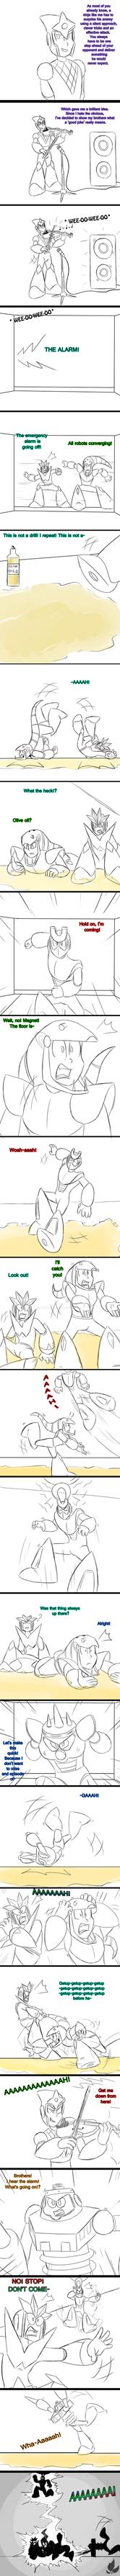 Ninja trick part 1 by zavraan